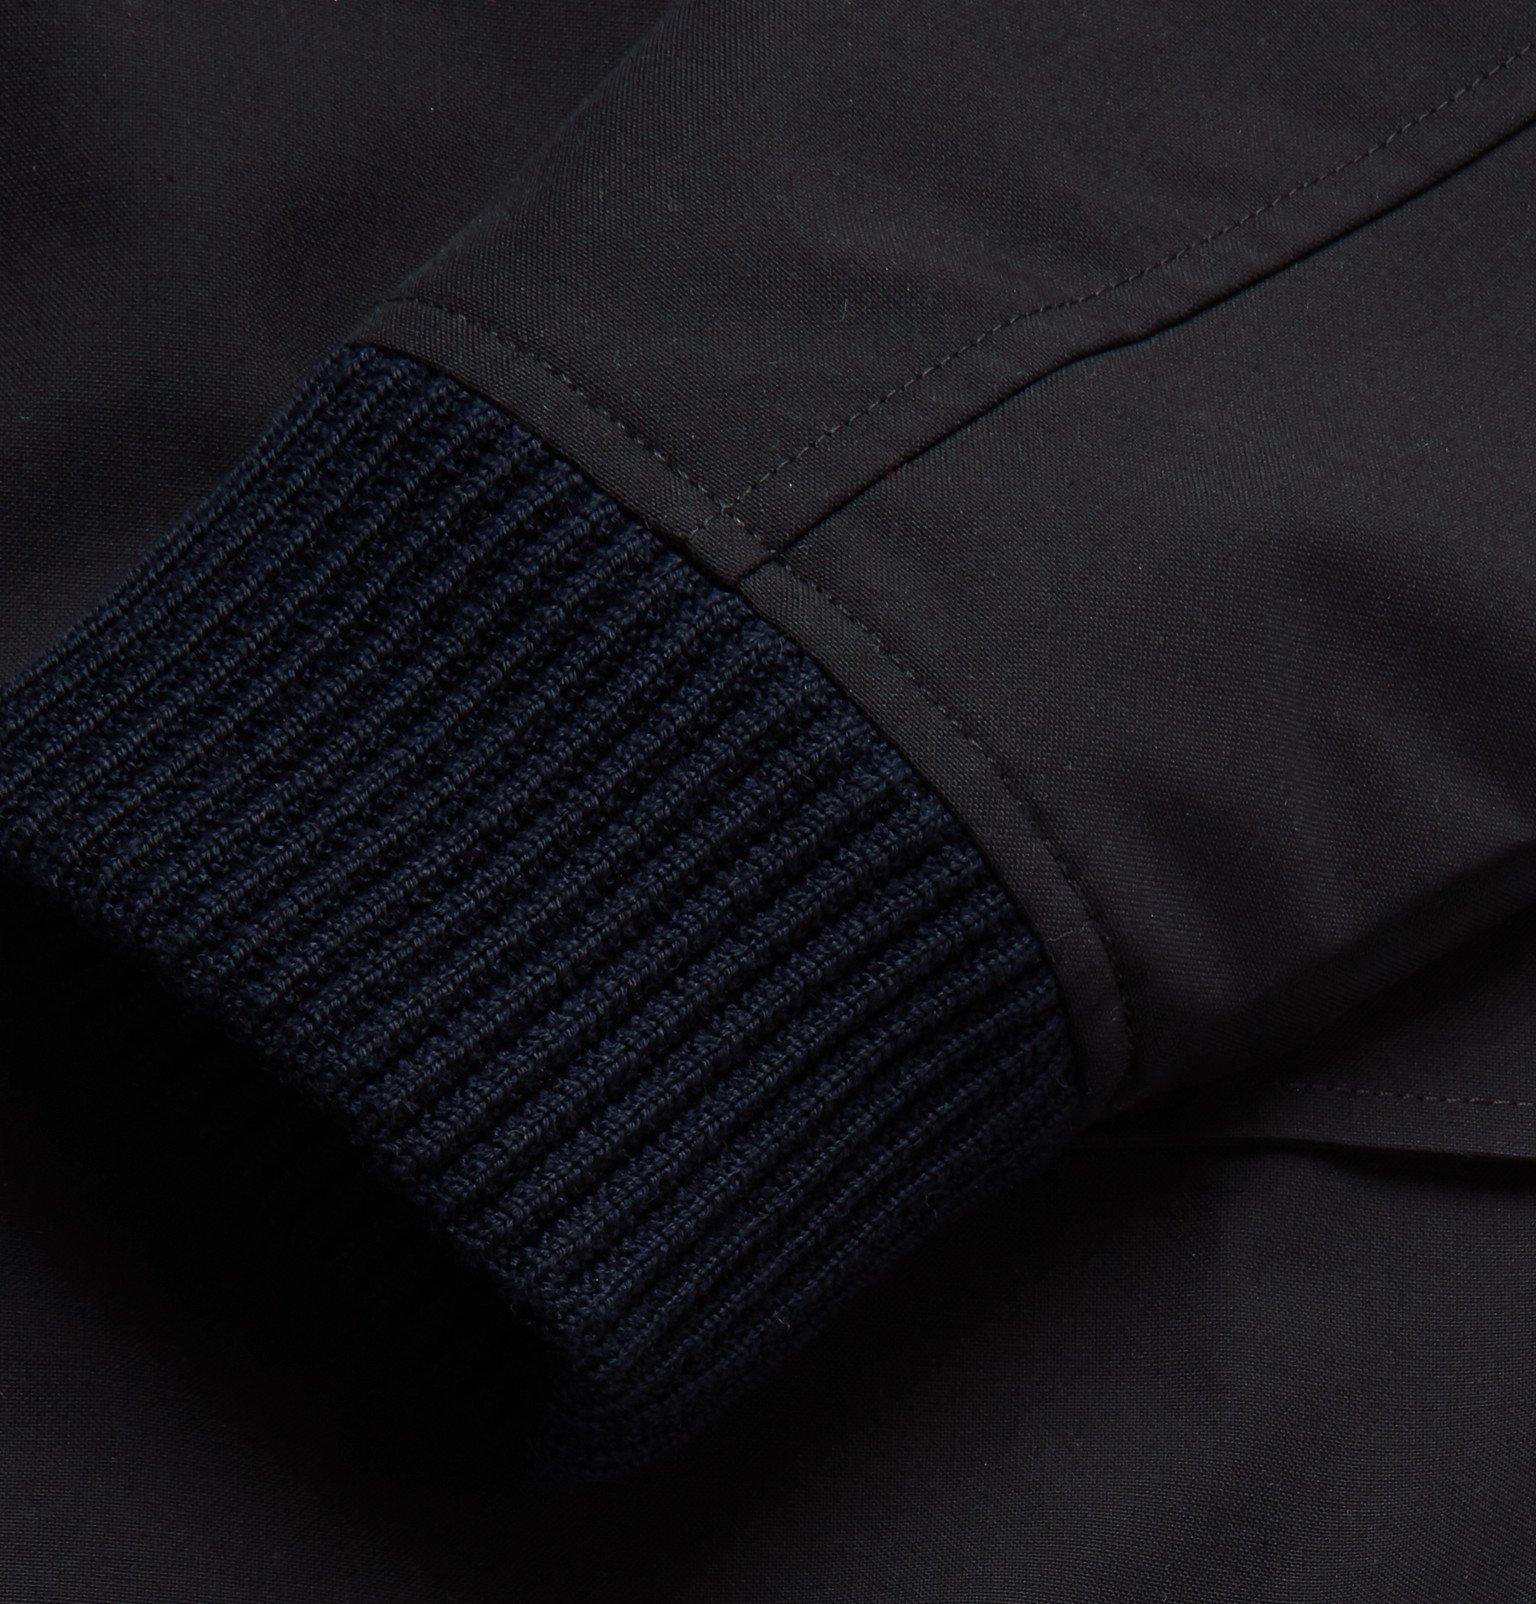 Officine Generale - Achille Shell Bomber Jacket - Blue